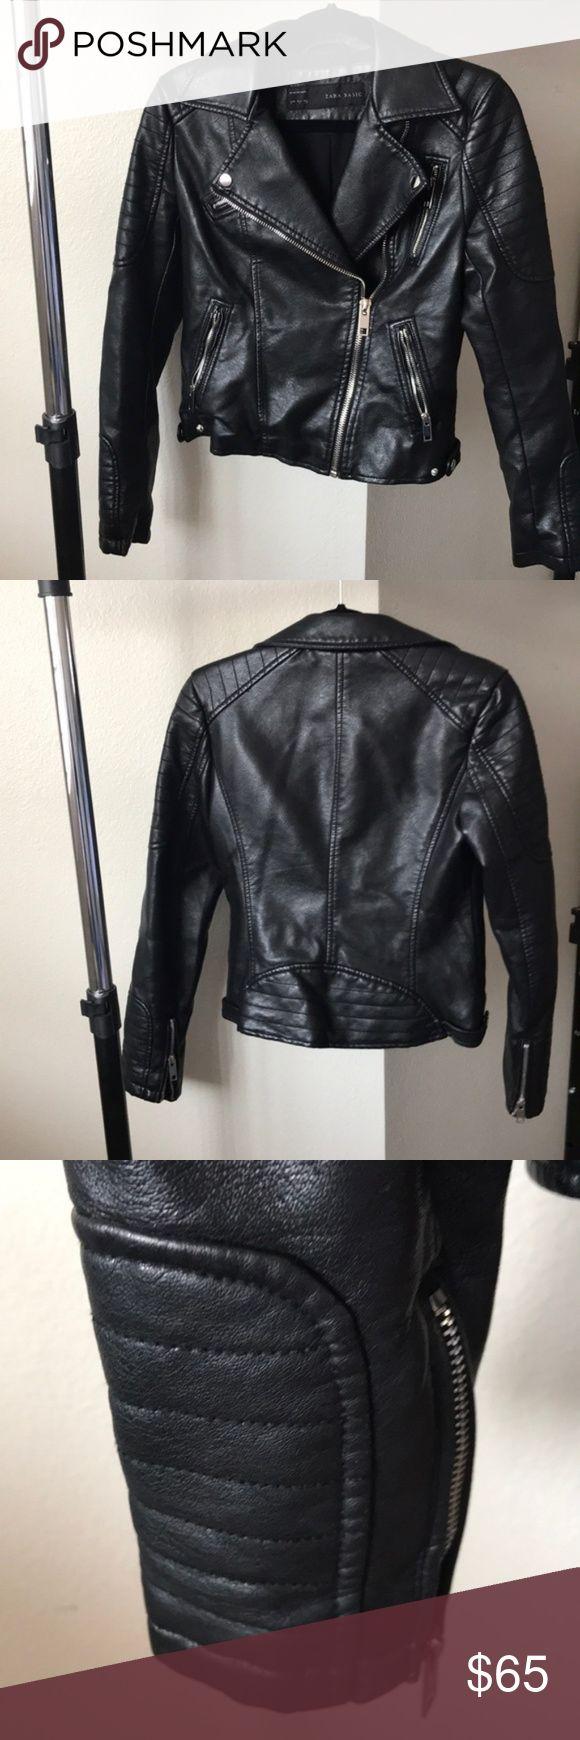 ZARA Black Faux Leather Moto Jacket ZARA black leather